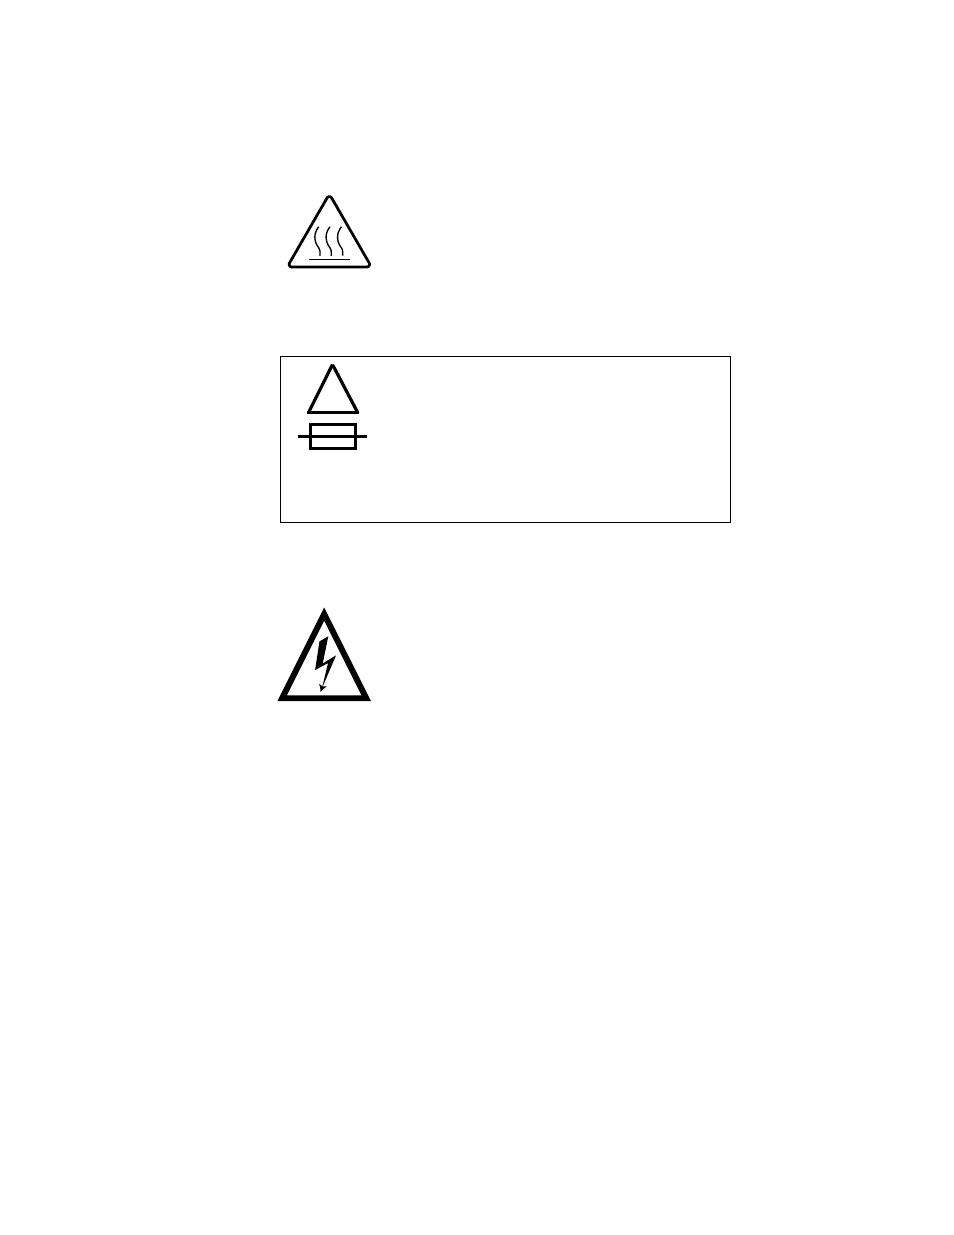 Cautionary symbols | Kodak 6B7198 User Manual | Page 6 / 112